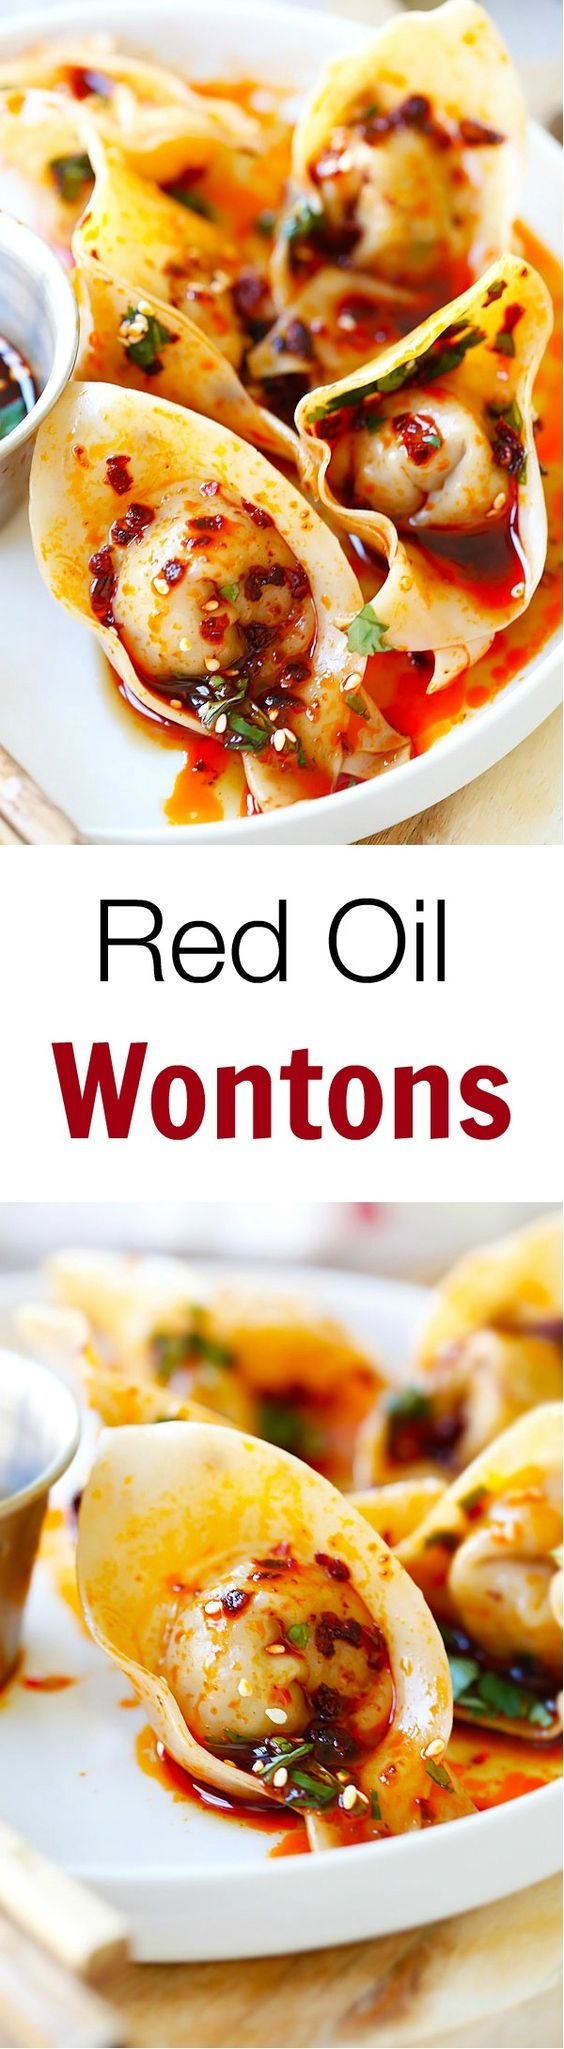 Sichuan Red Oil Wontons